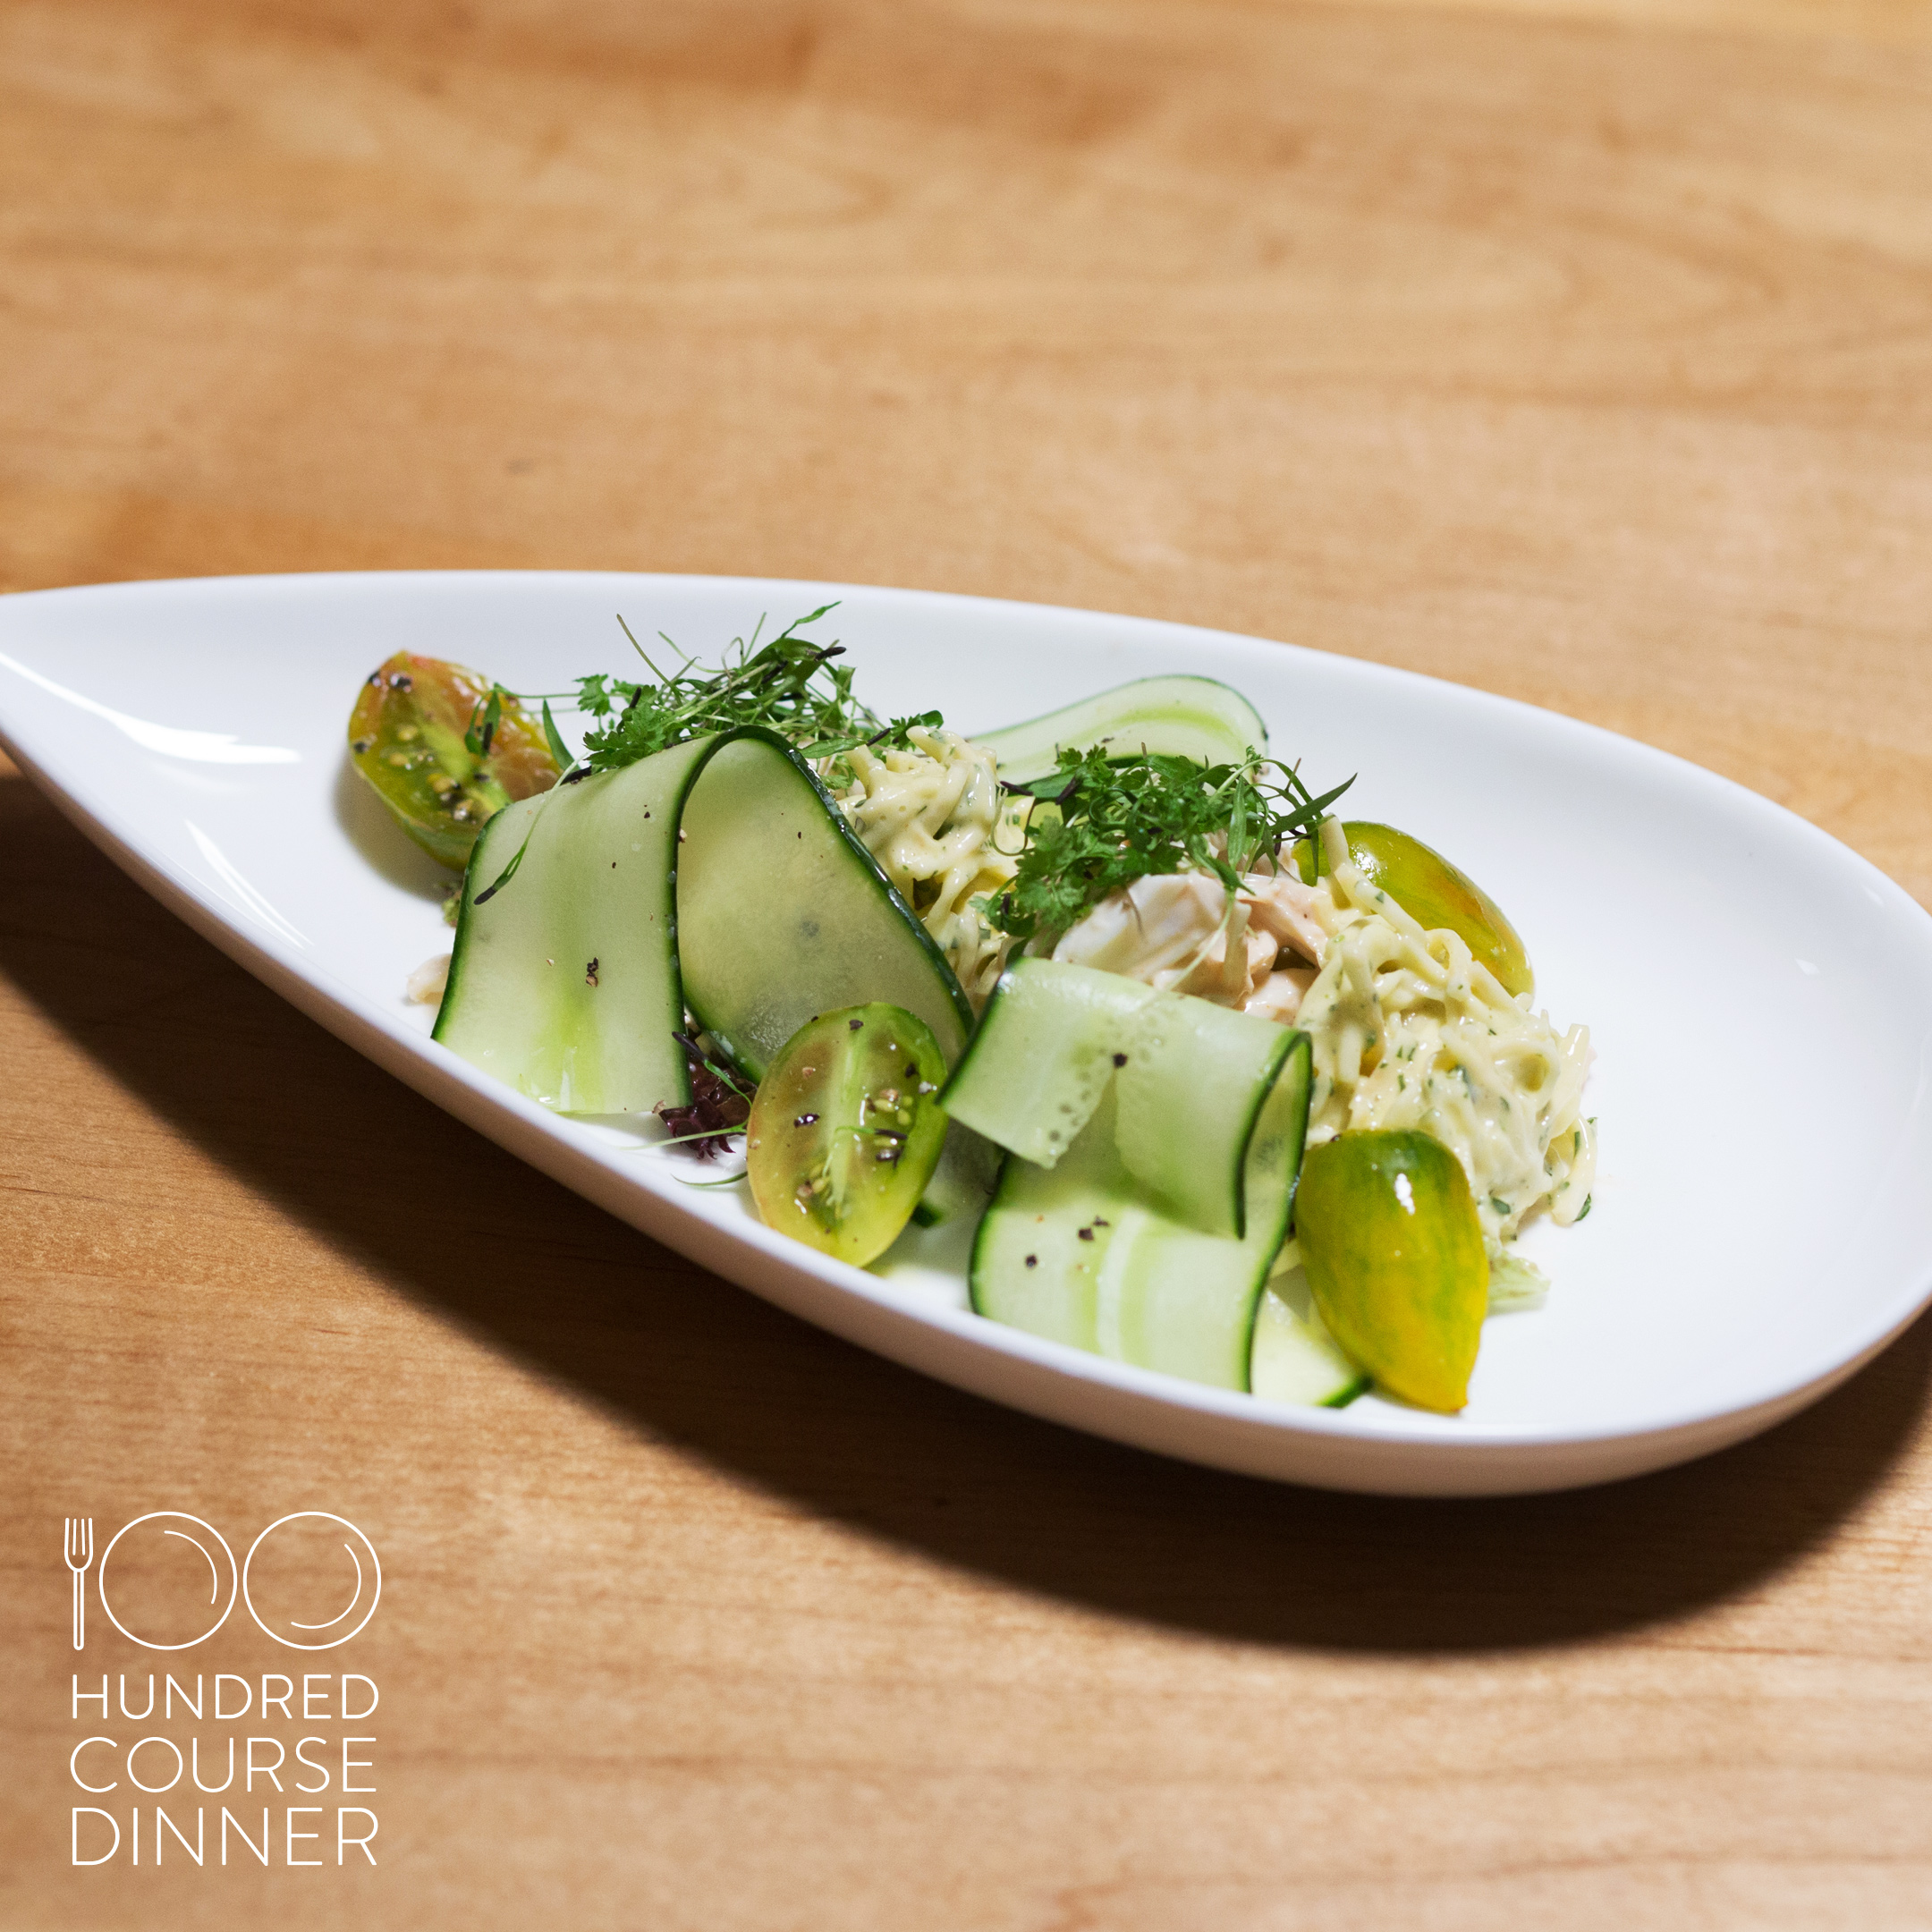 33-Crab-Danielle-Salad-Ralphs-On-The-Park_square_logo.jpg